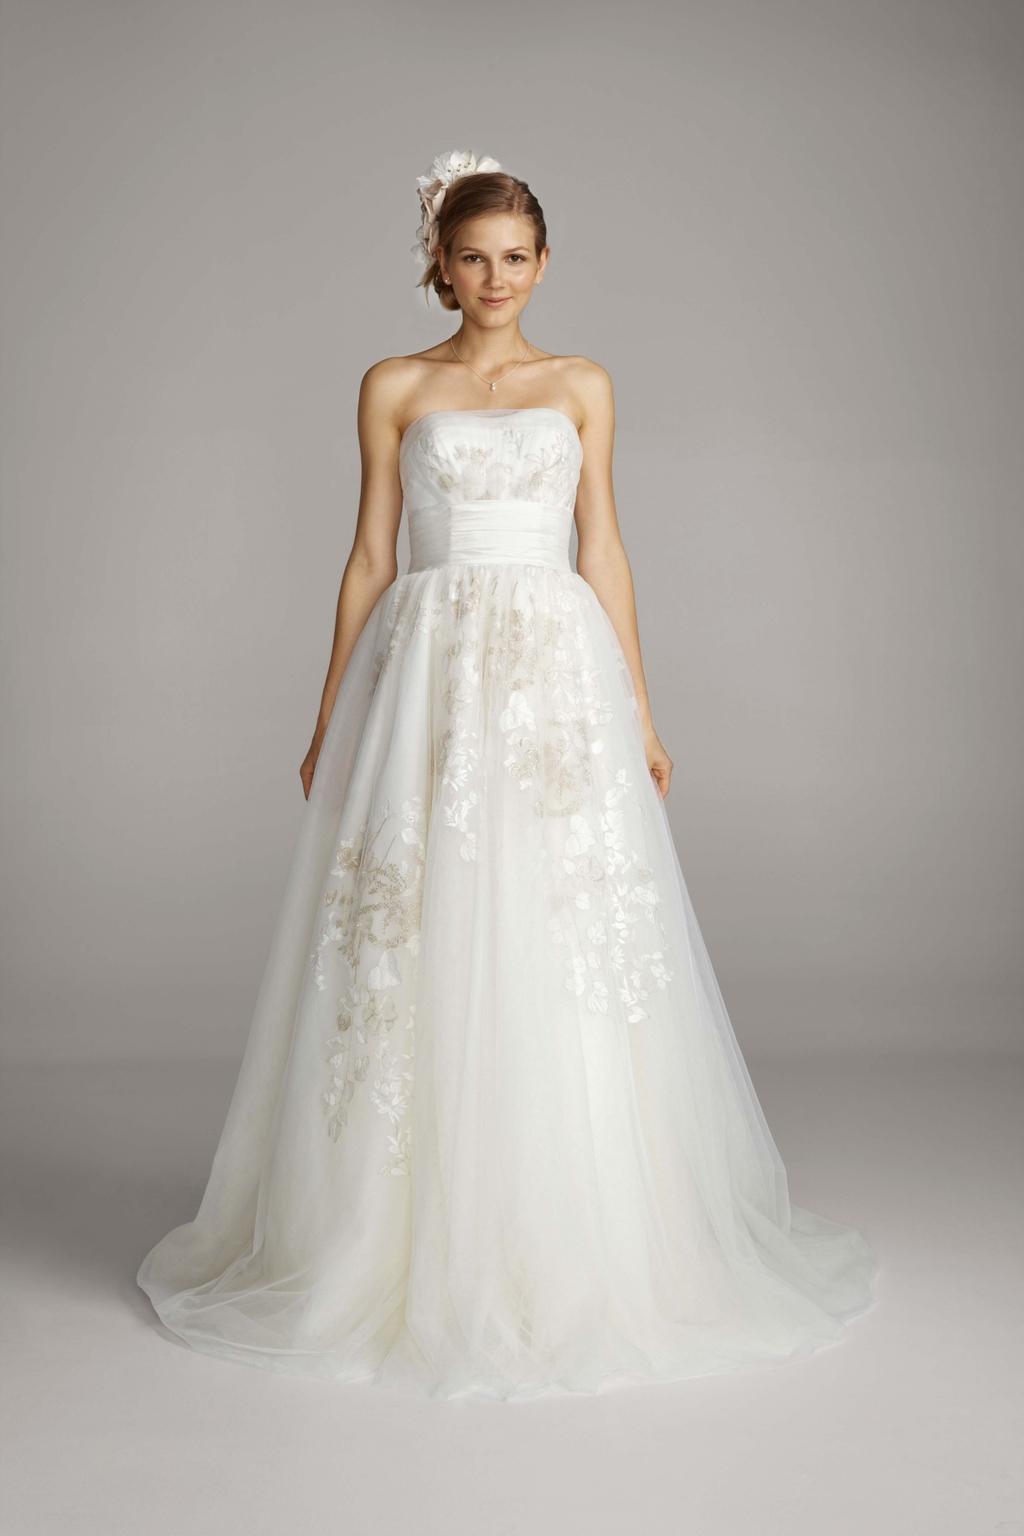 2013 wedding dress melissa sweet for davids bridal 0877 for Davids bridal cheap wedding dresses